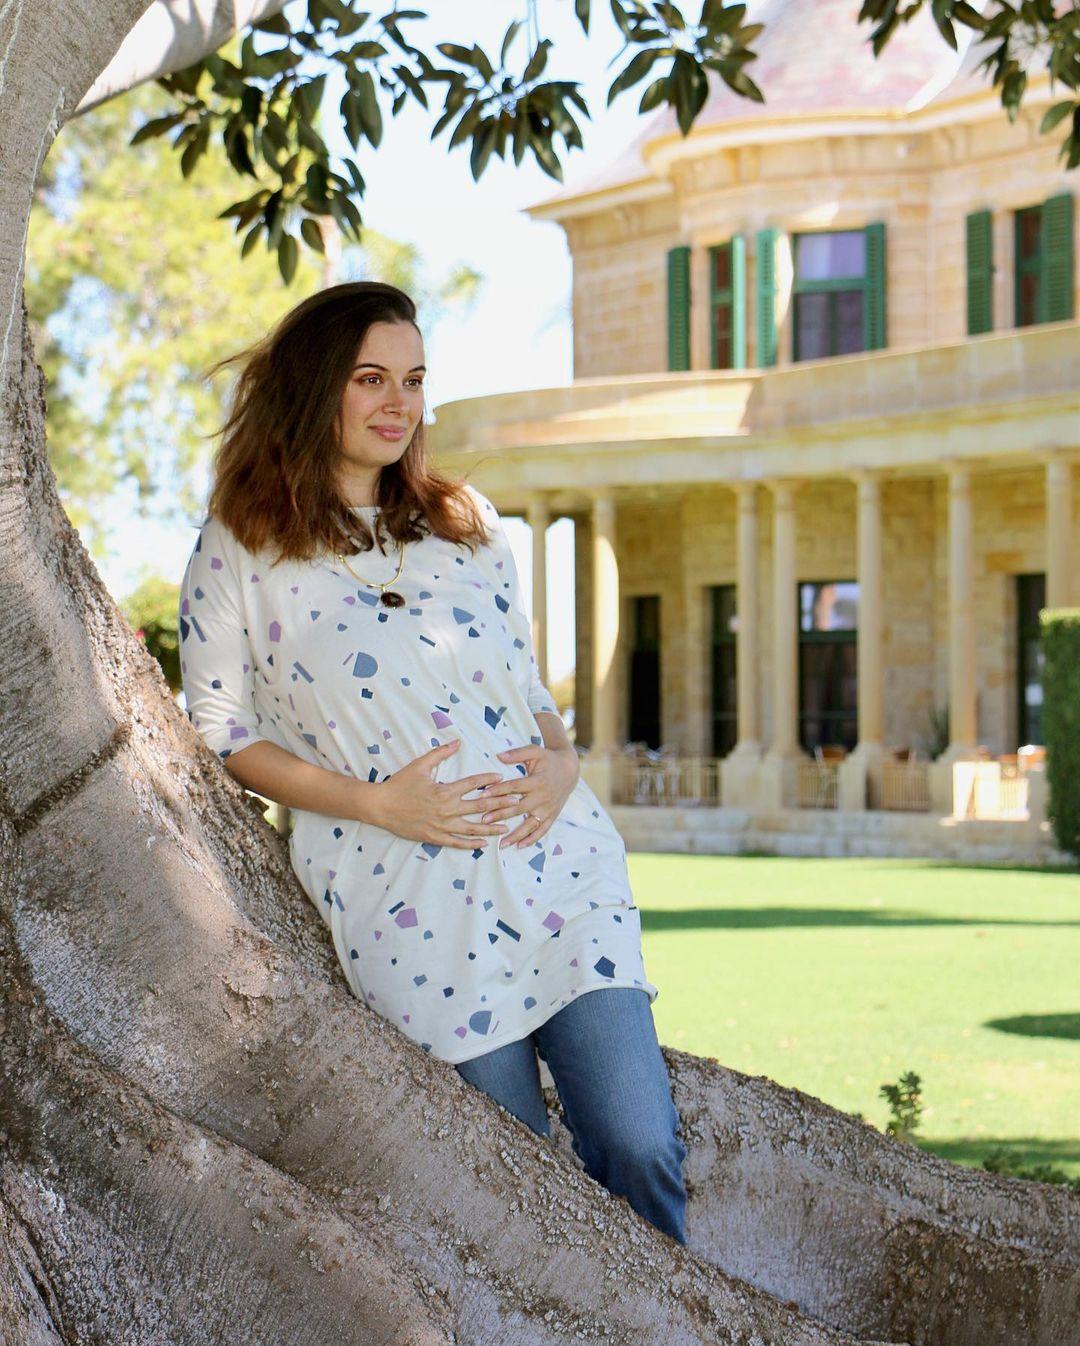 evelyn sharma pregnant